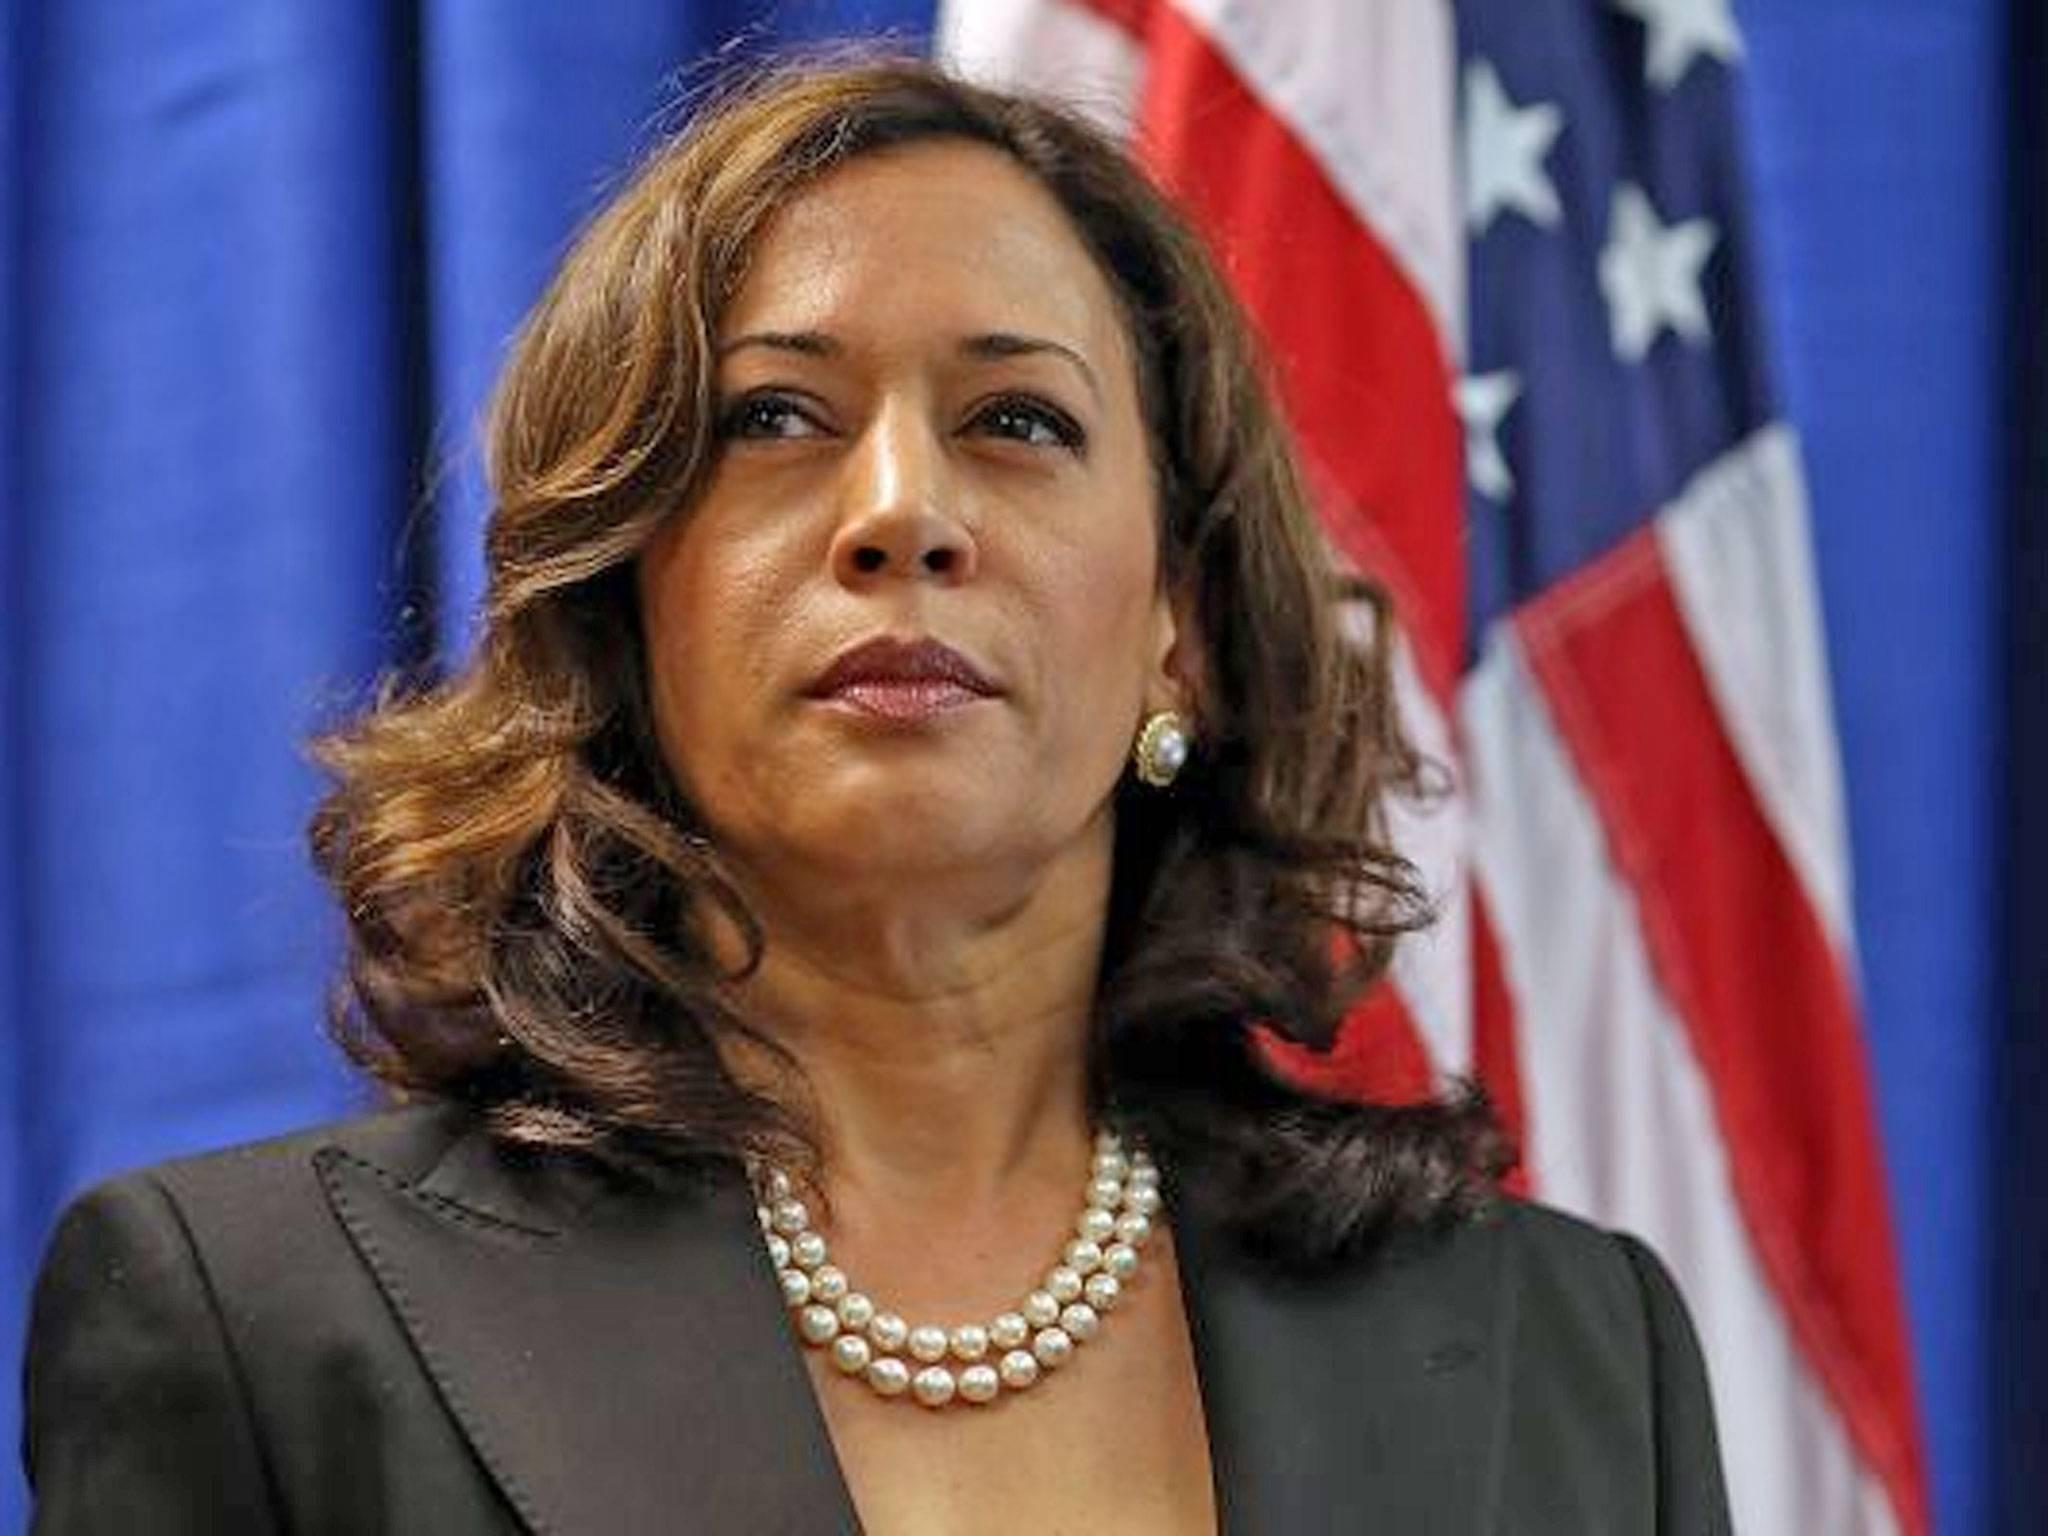 Impact Players: Kamala Harris — California Attorney General California's first female attorney general